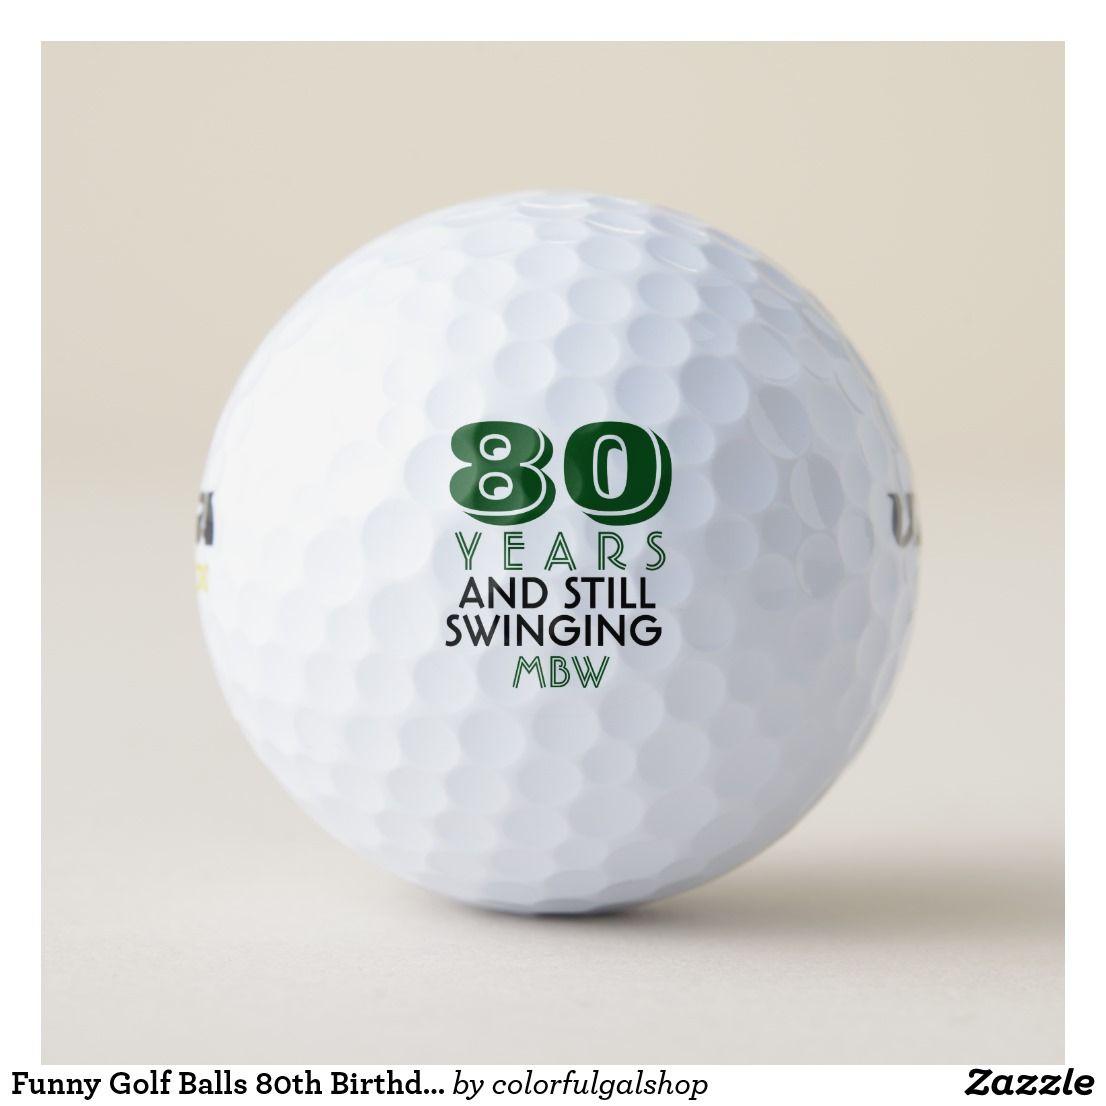 Funny Golf Balls 80th Birthday Party Monogrammed